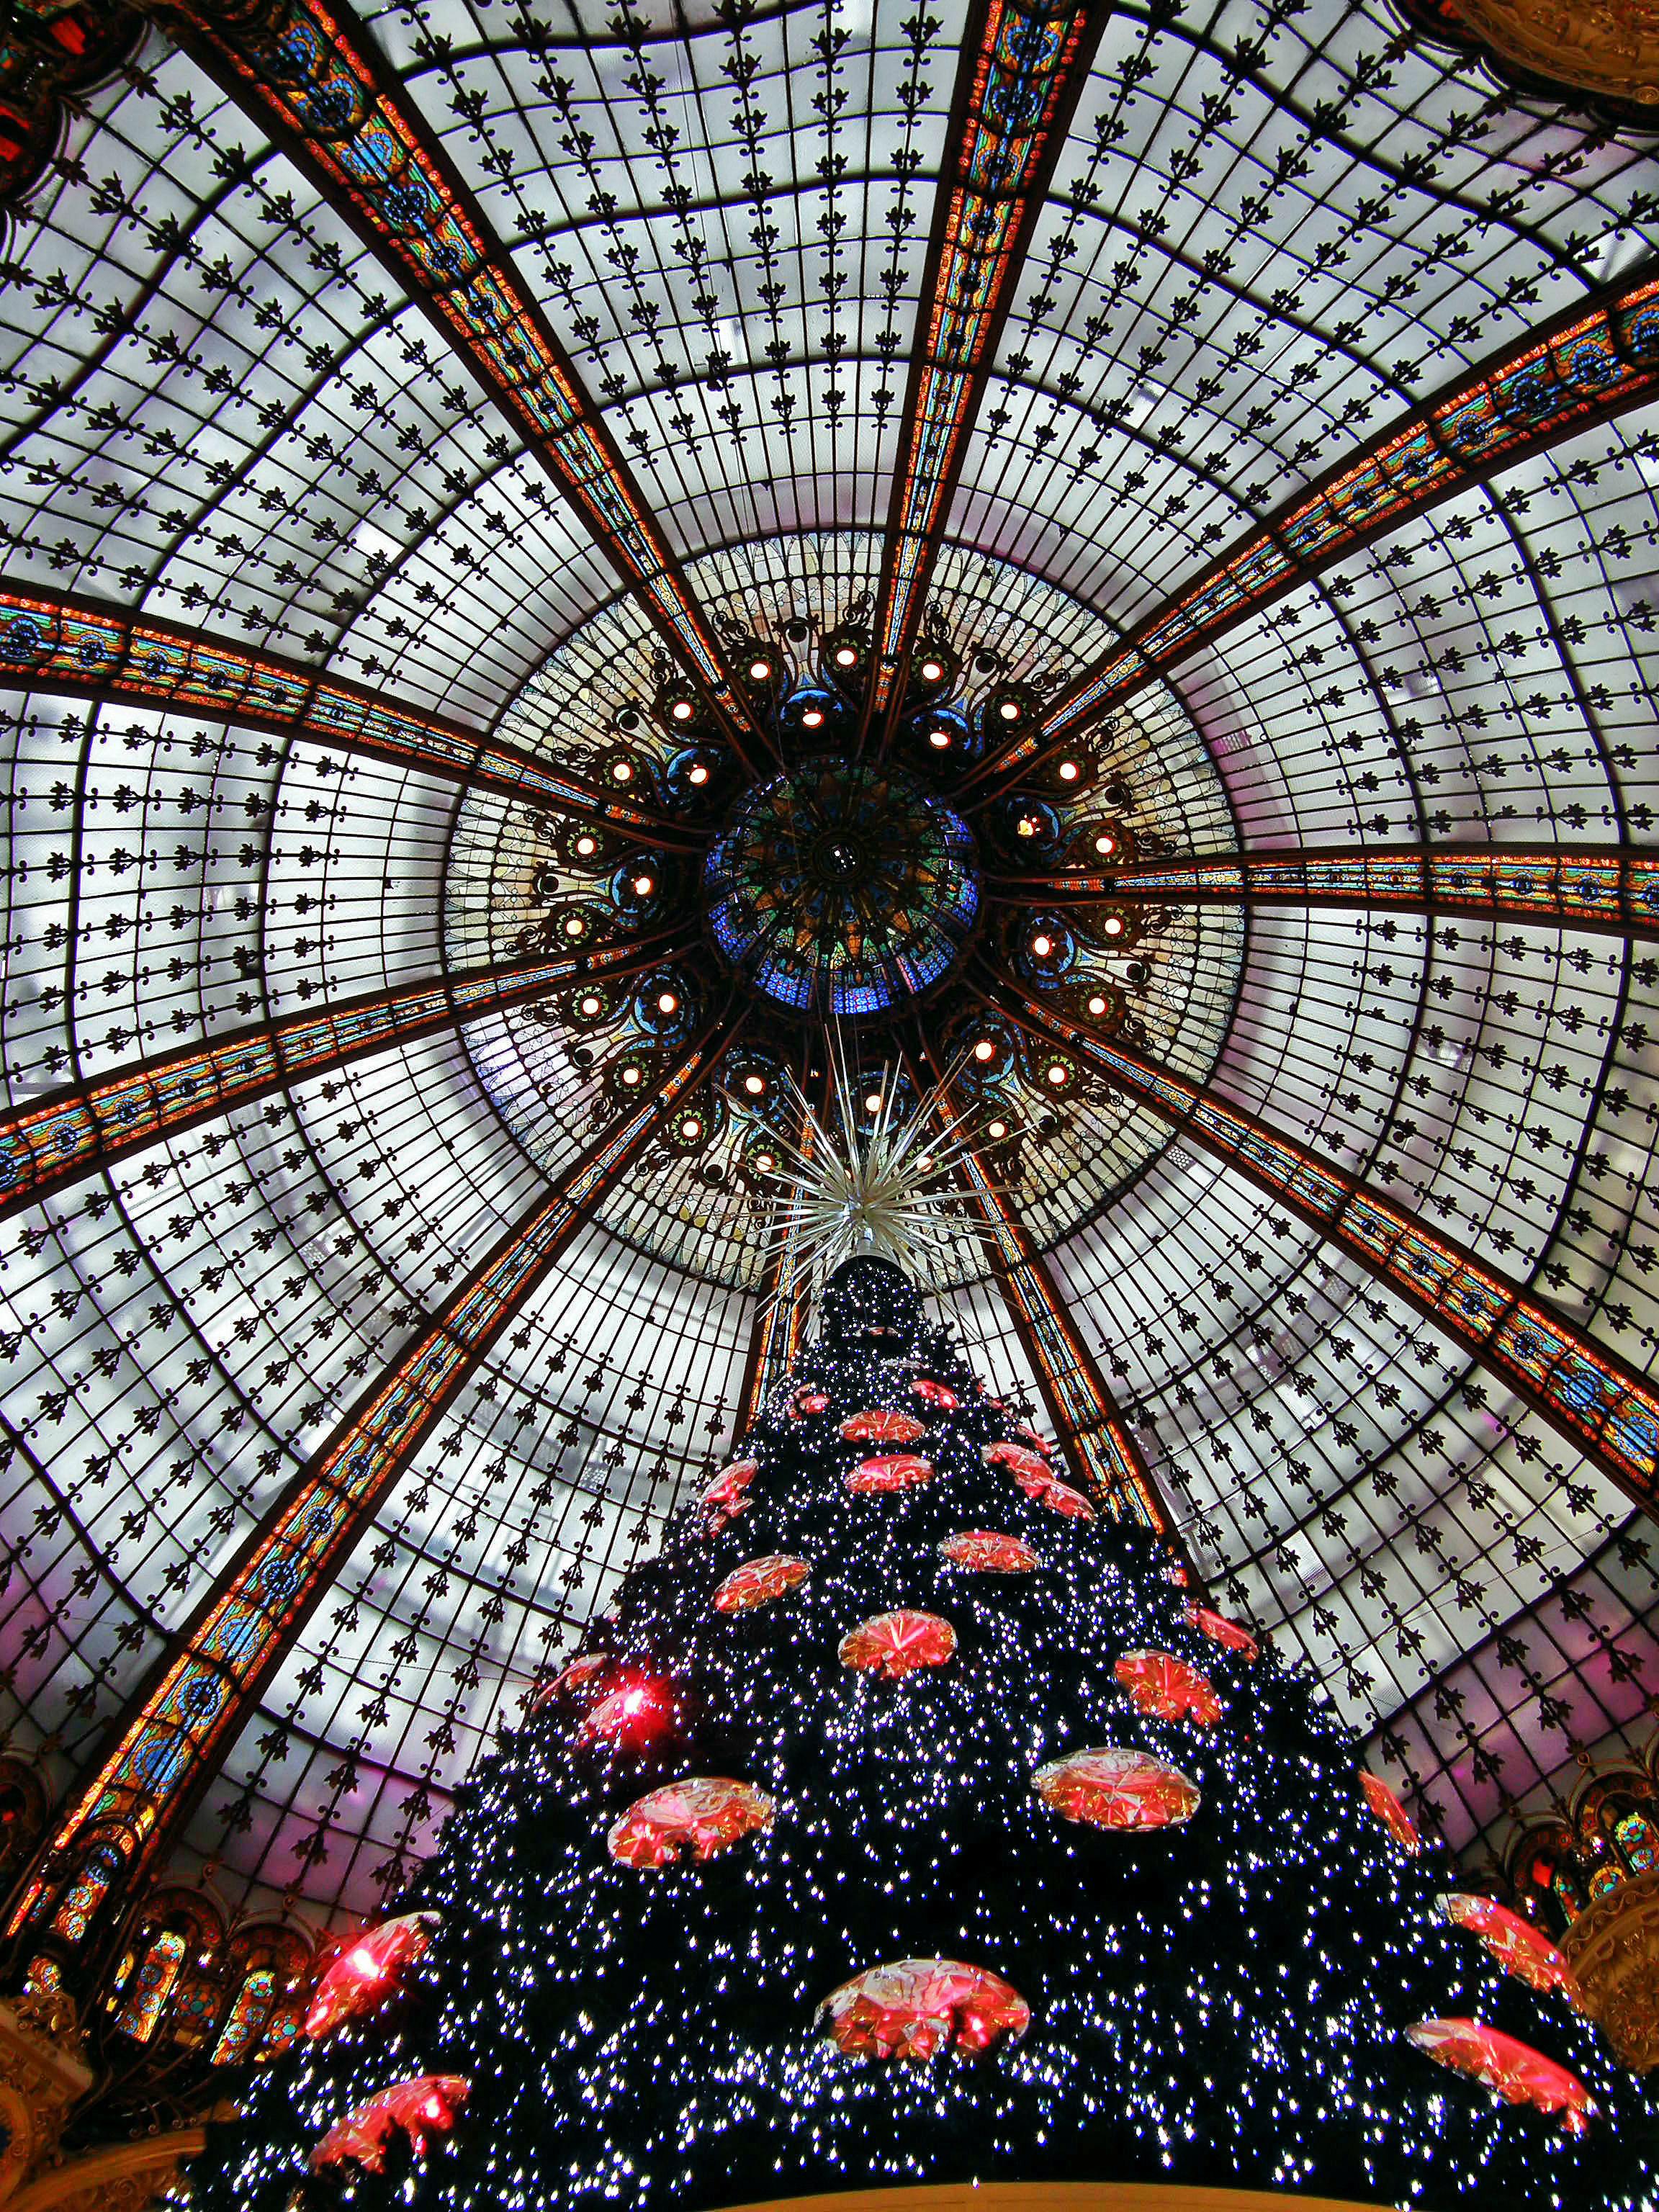 Heaven Noël (Christmas in Paris) | Paris Inspired